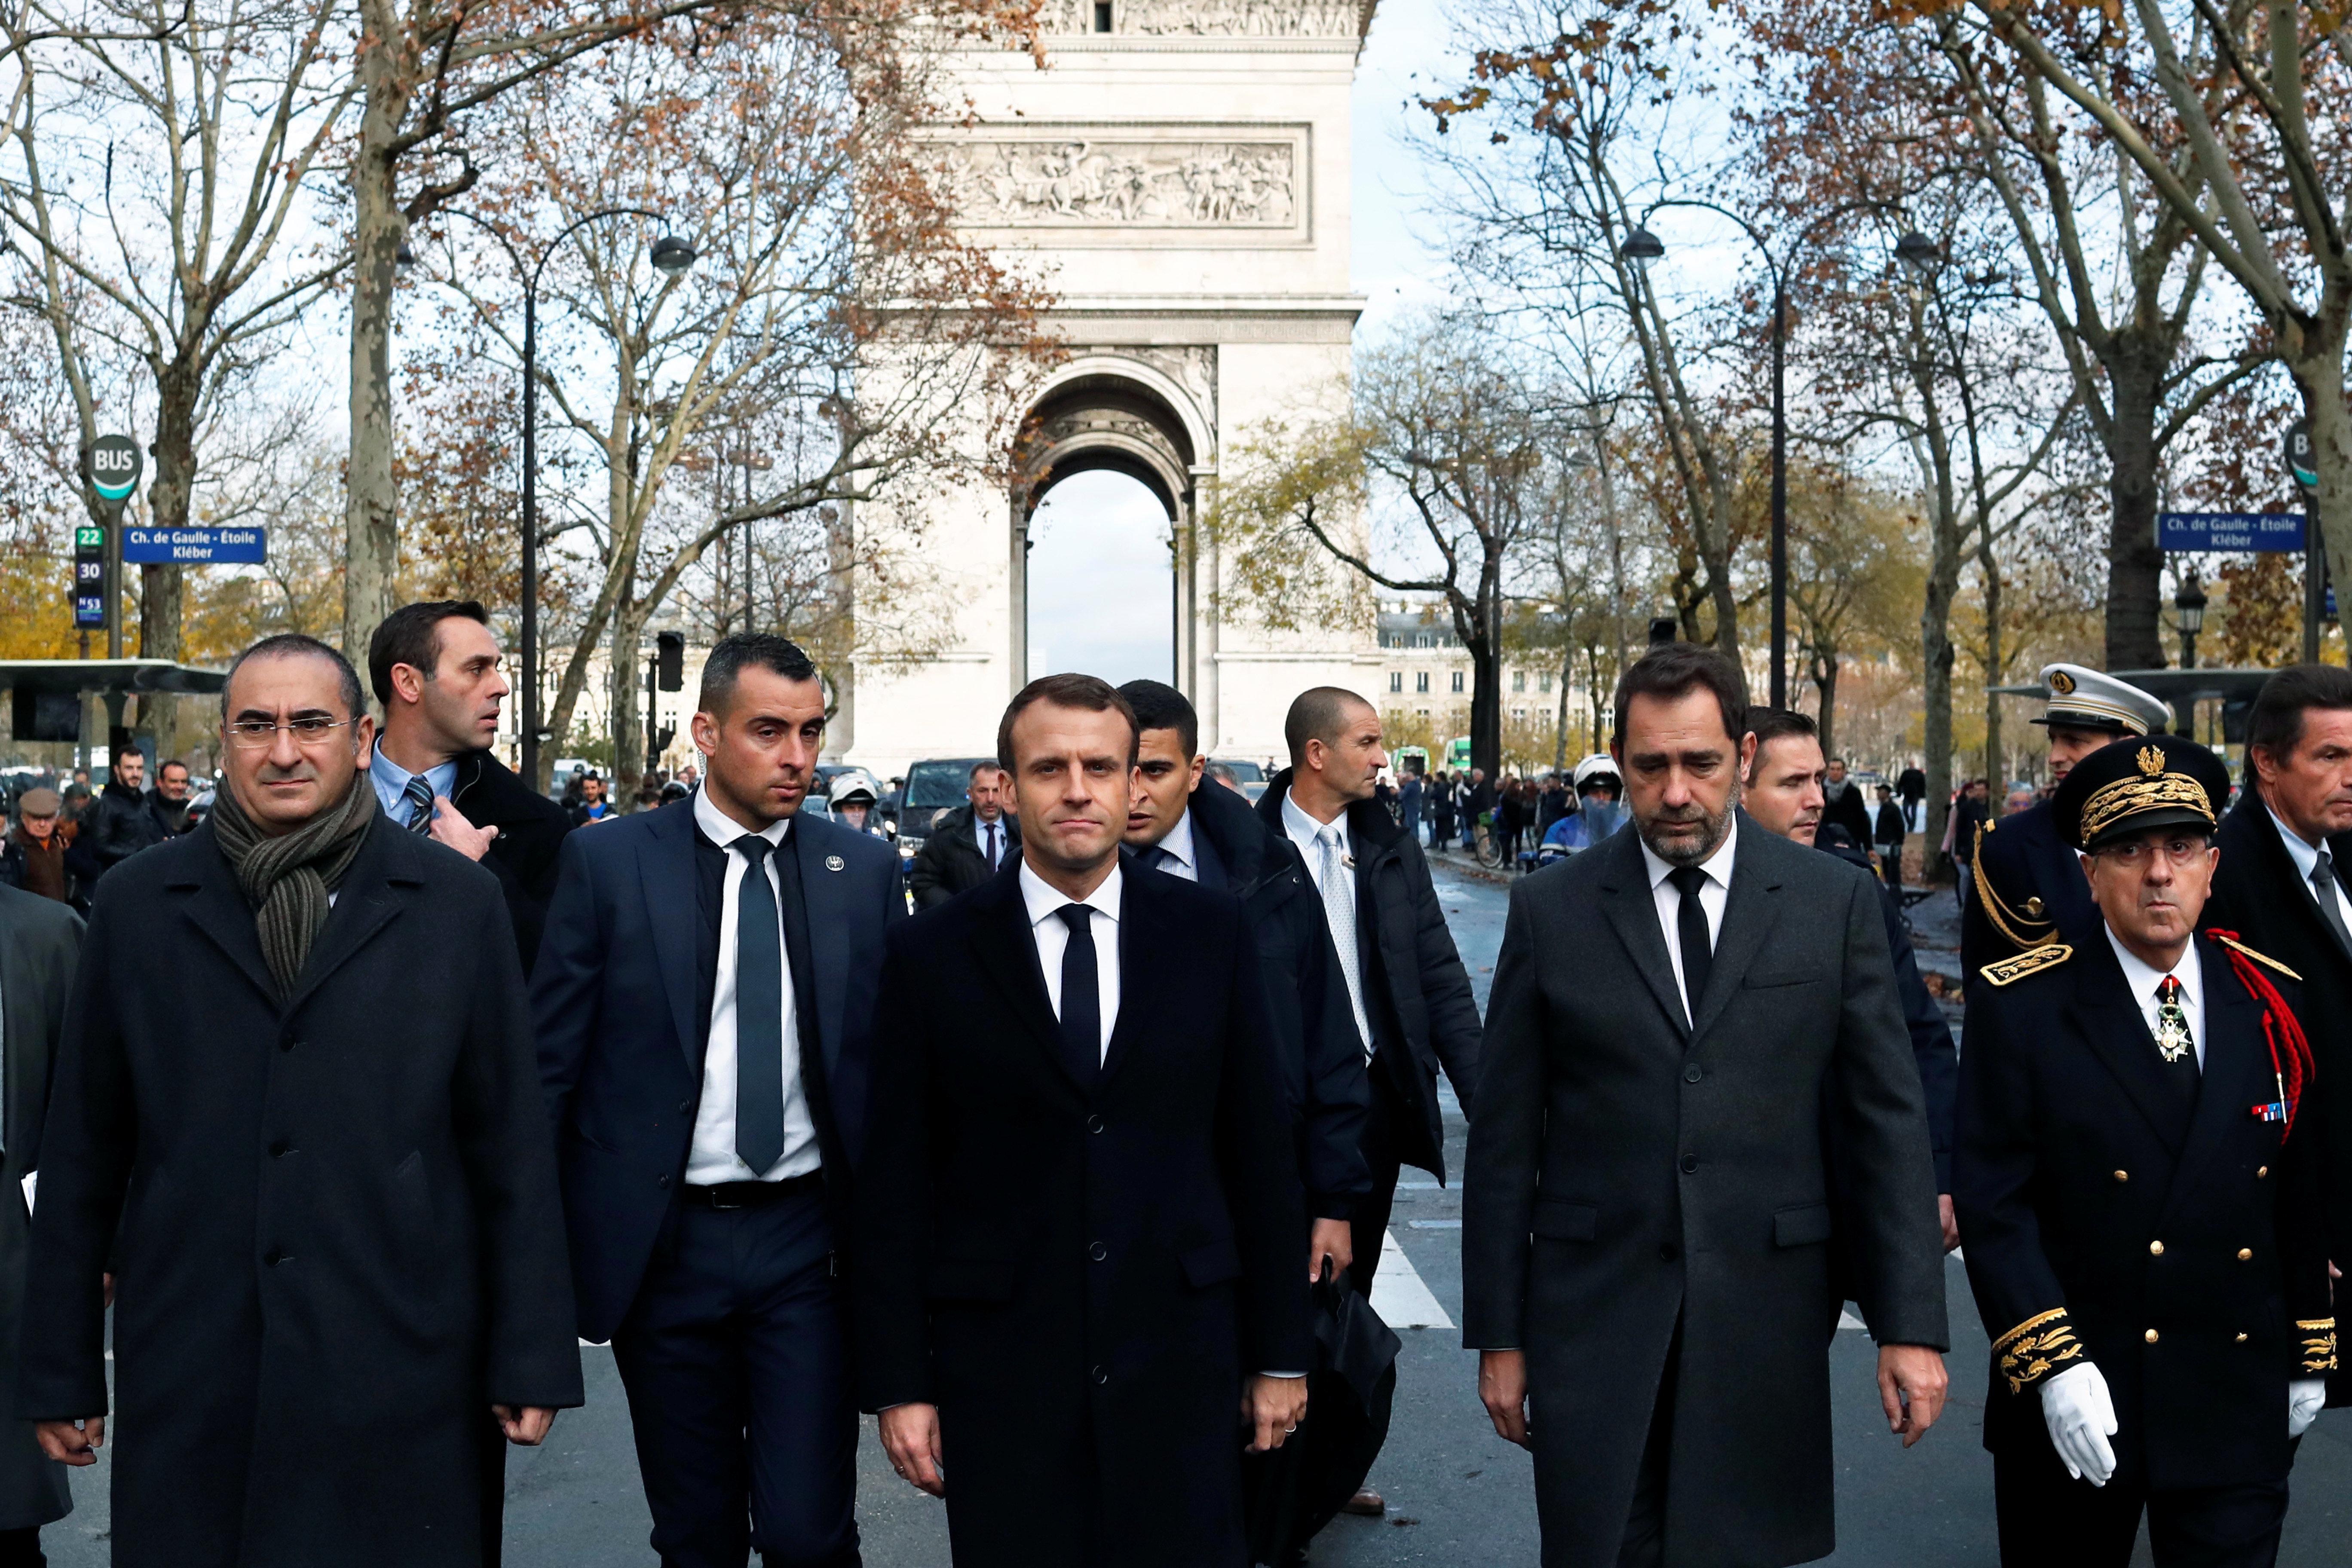 Macron Tours Damaged Paris Site In Aftermath Of Riots